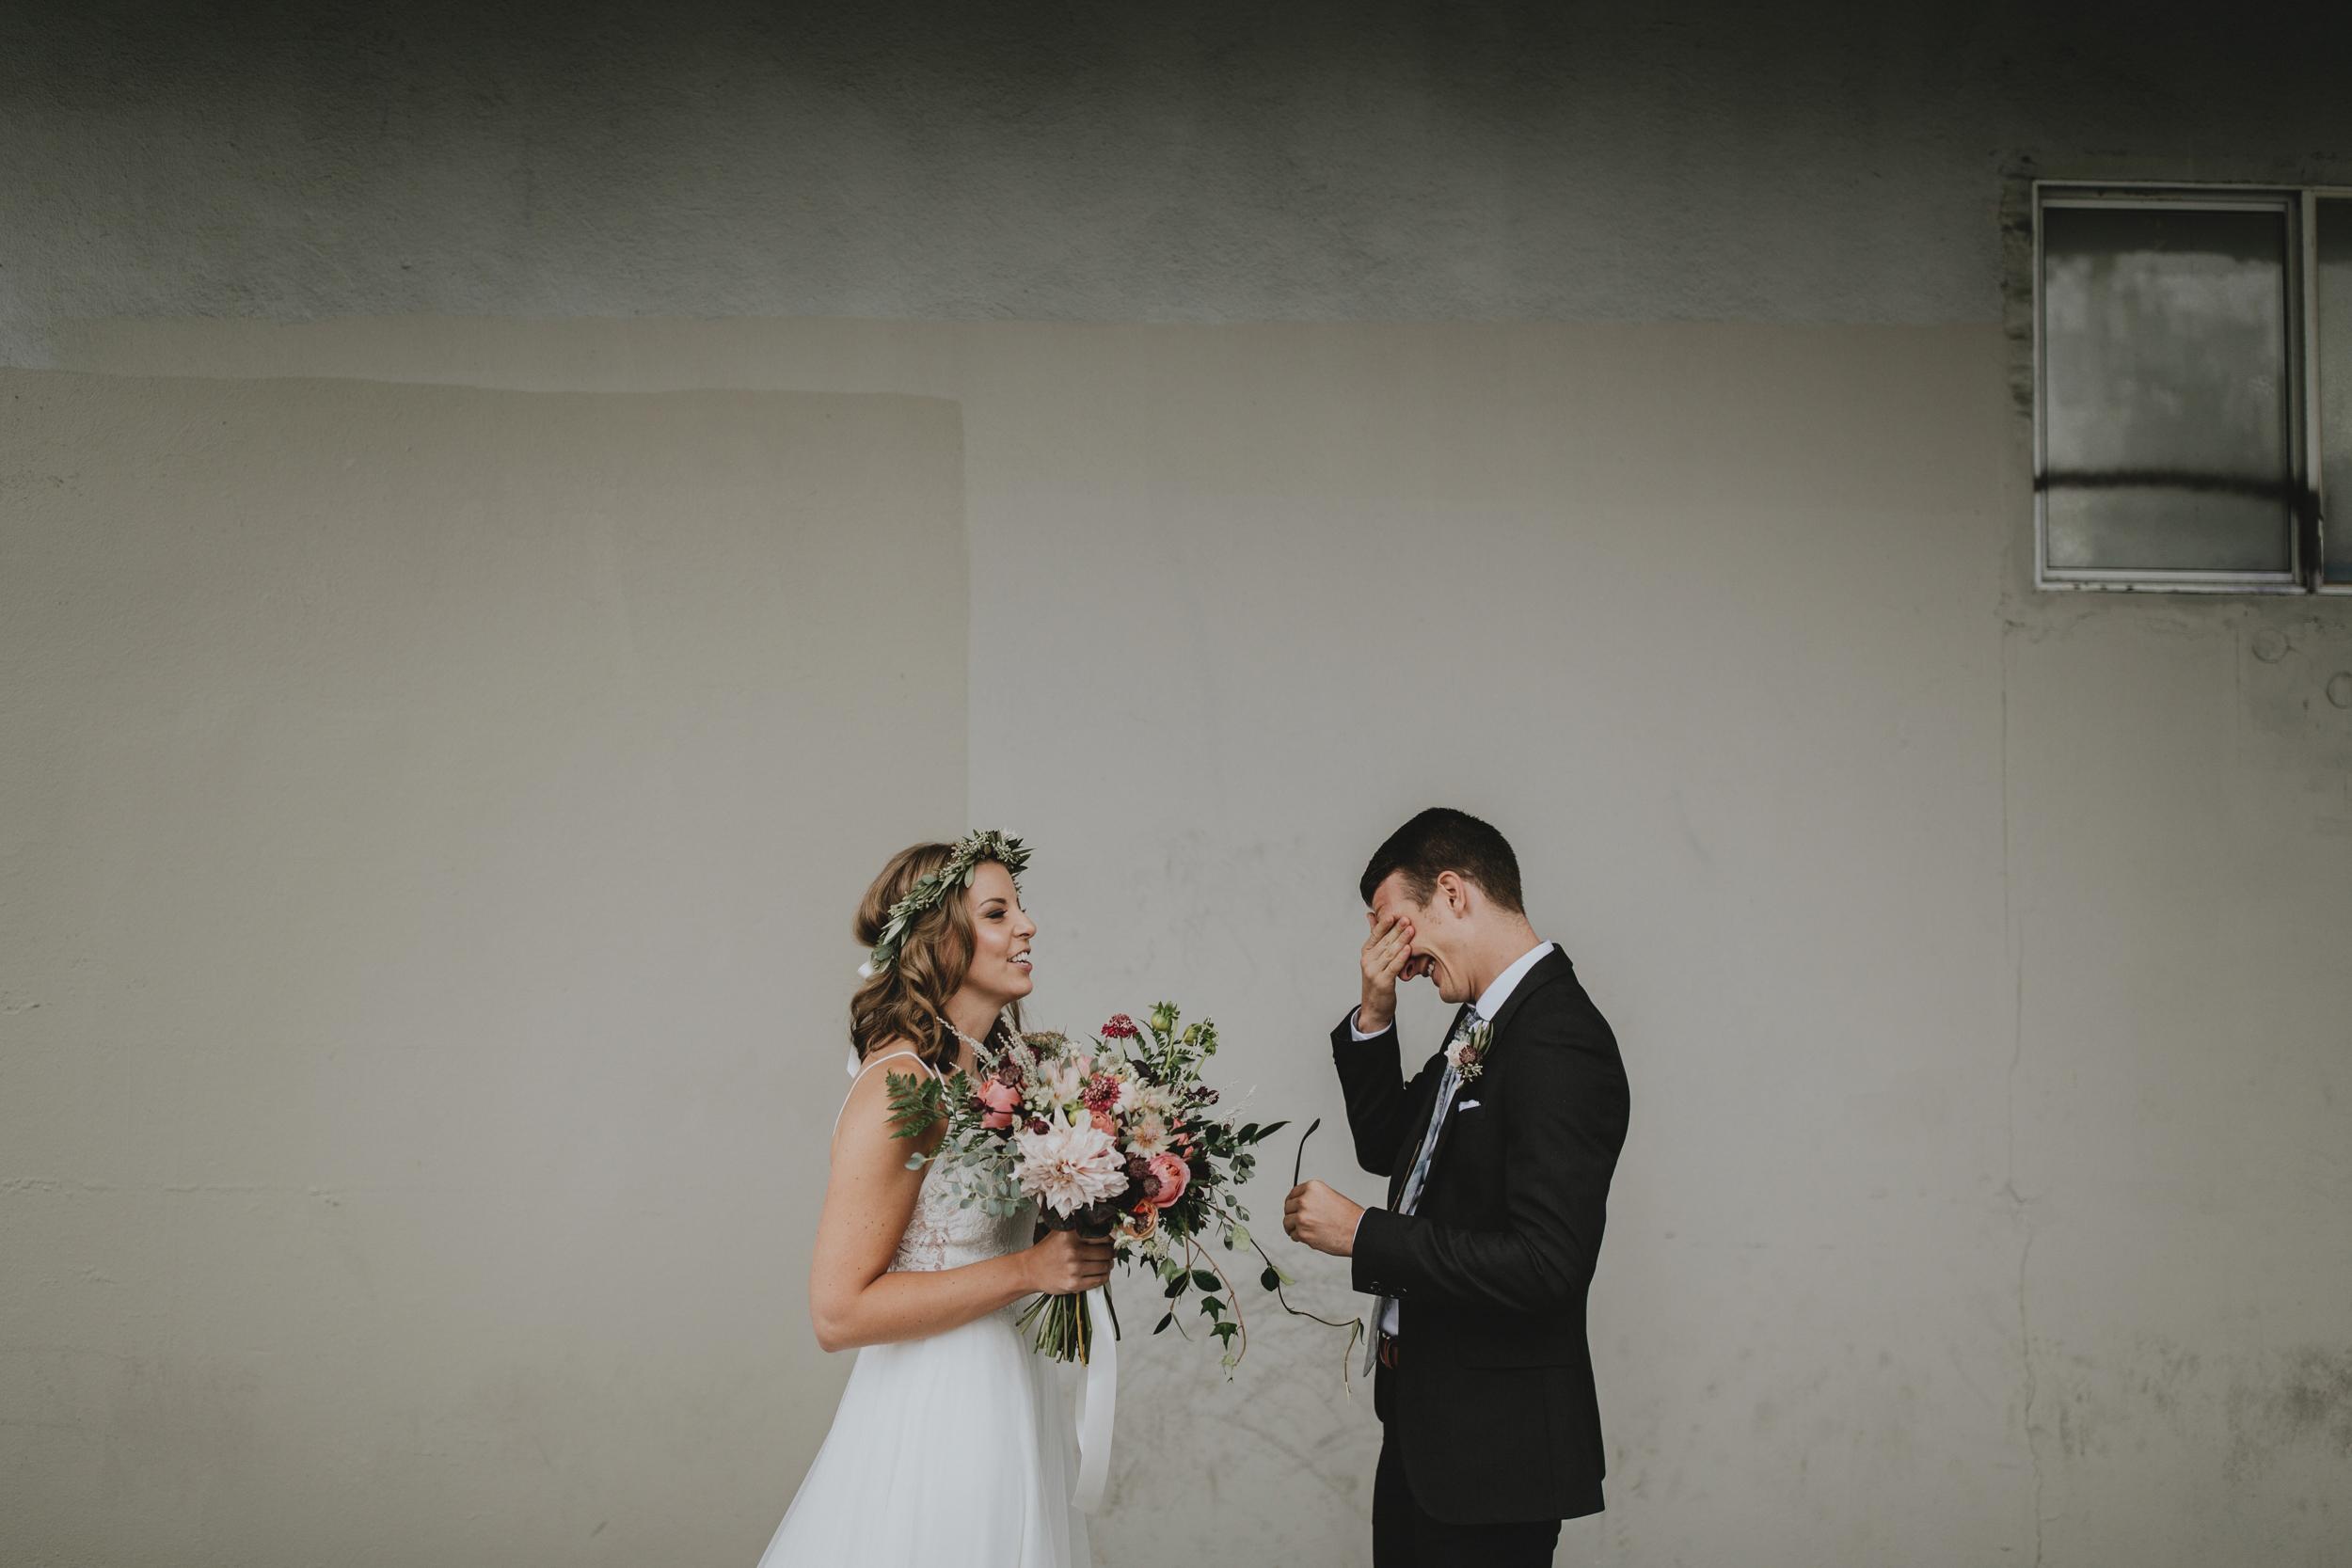 Railtown-City-Vancouver-Wedding-4.jpg